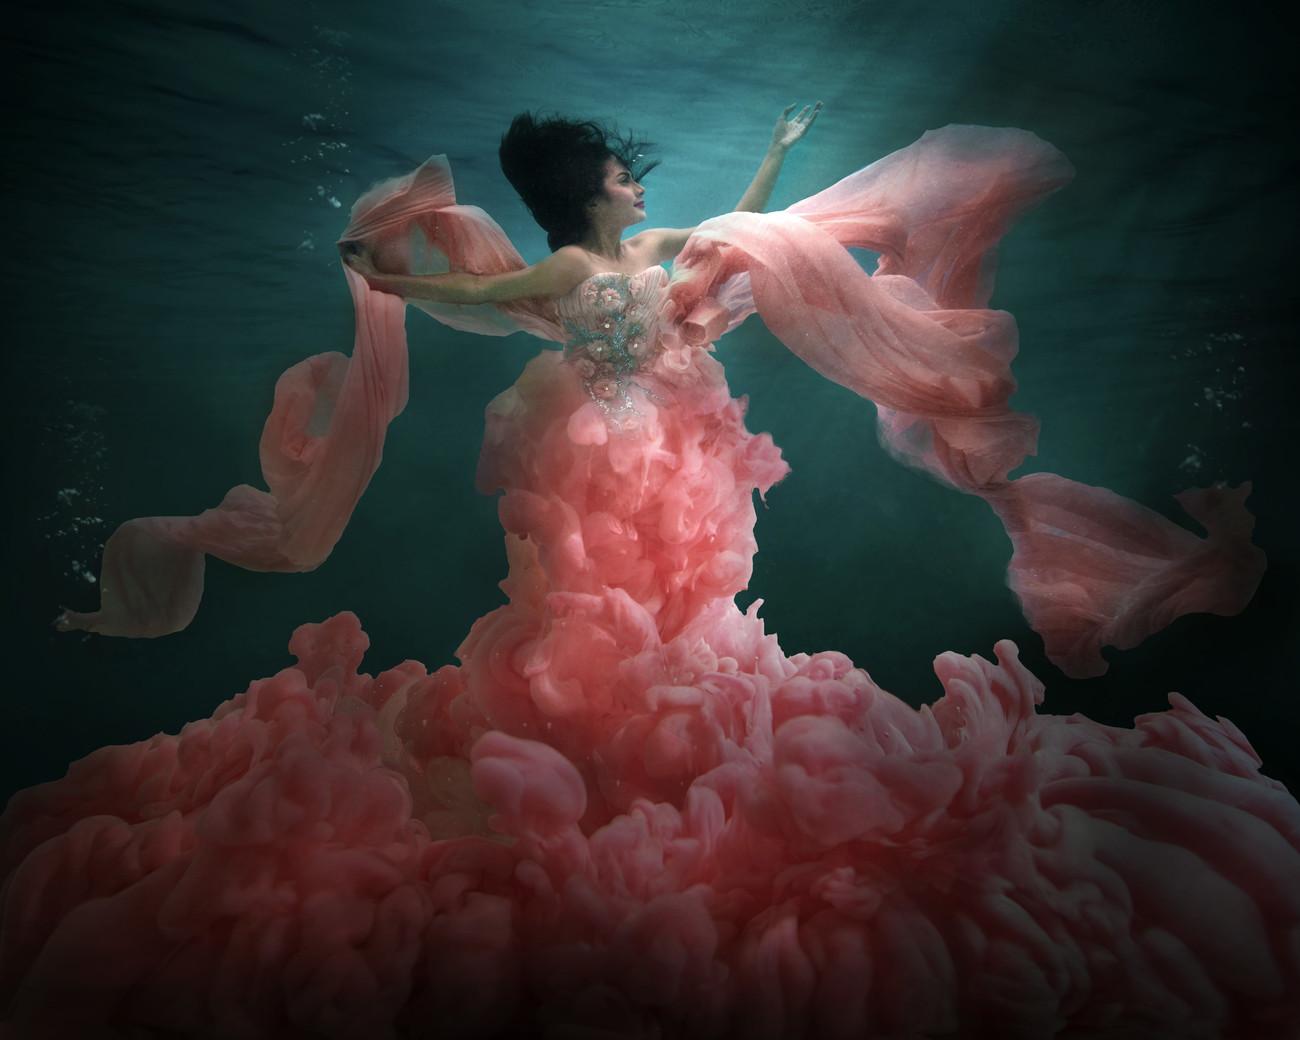 Inspiracje: Living Coral – kolor roku 2019 Instytutu Pantone®